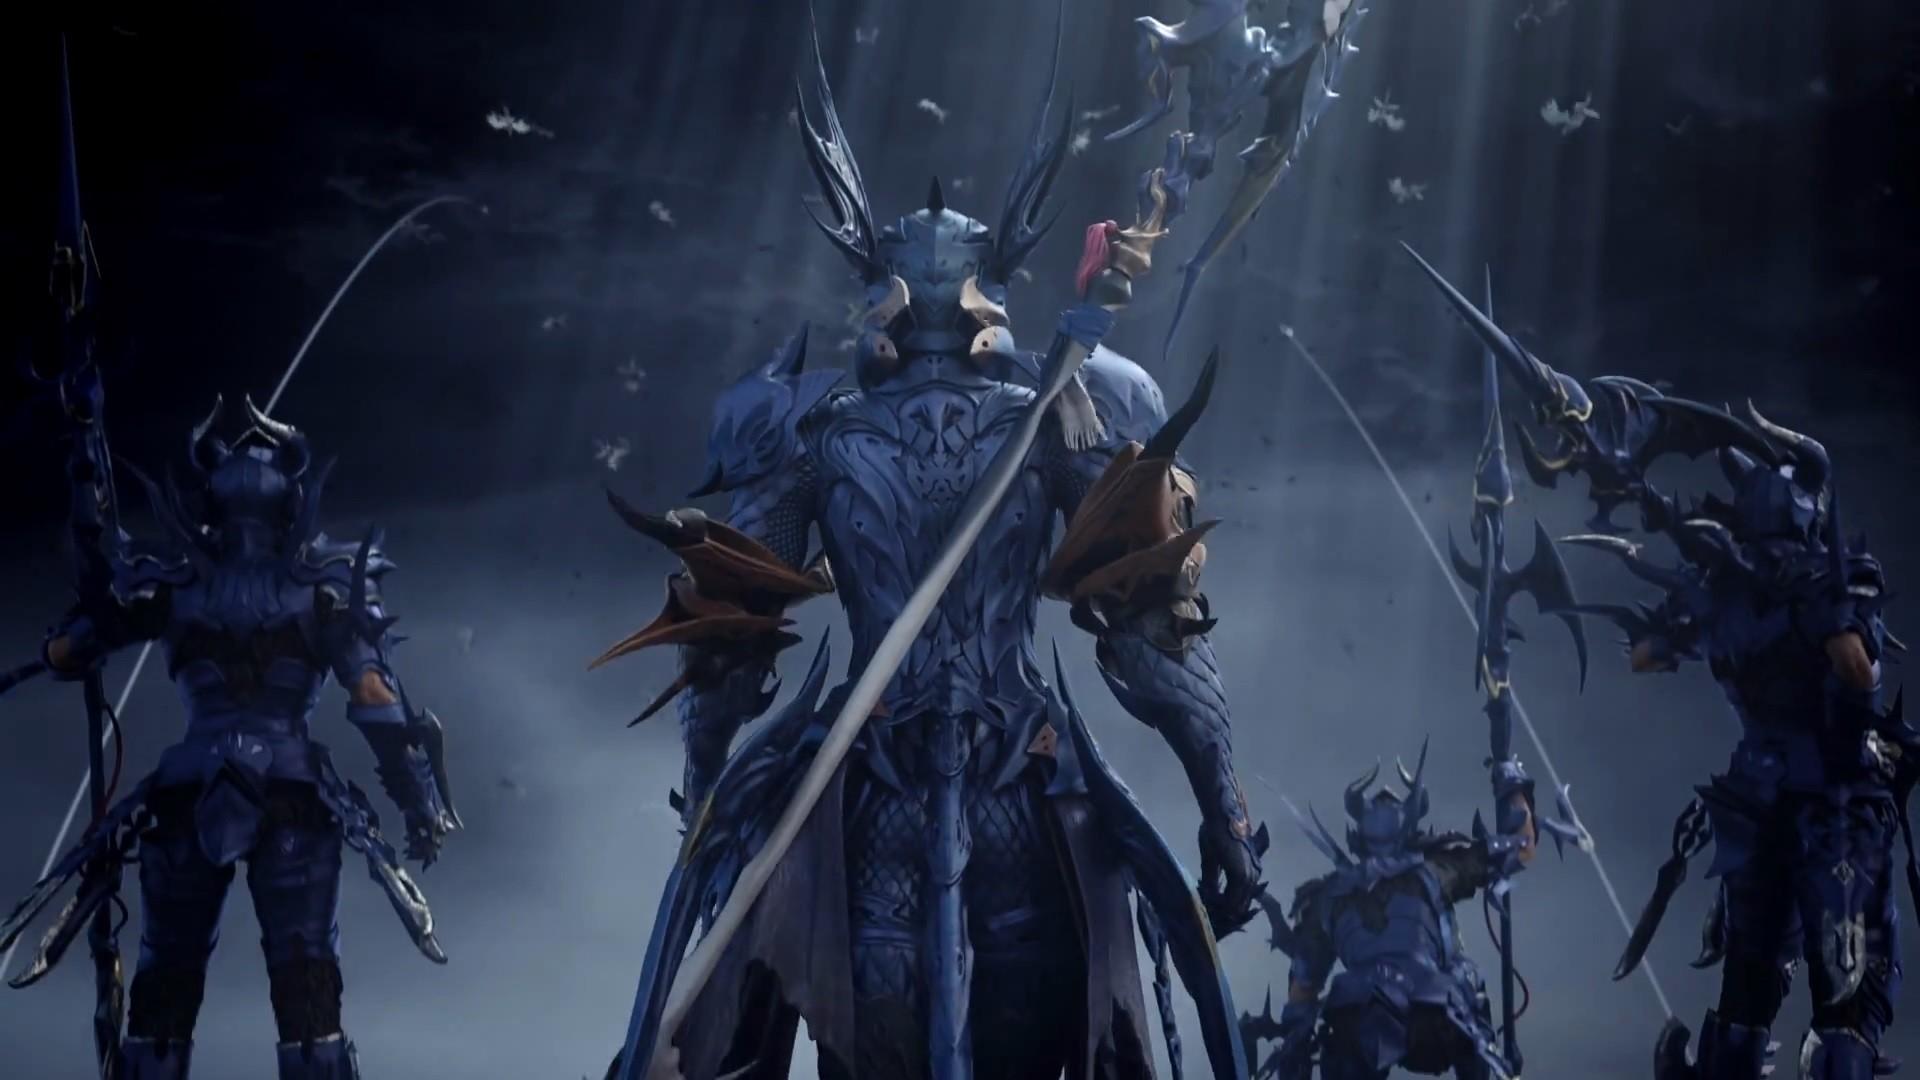 Final Fantasy XIV: A Realm Reborn – Heavensward DLC (2015) PS4 Review –  FilmGamesEtc